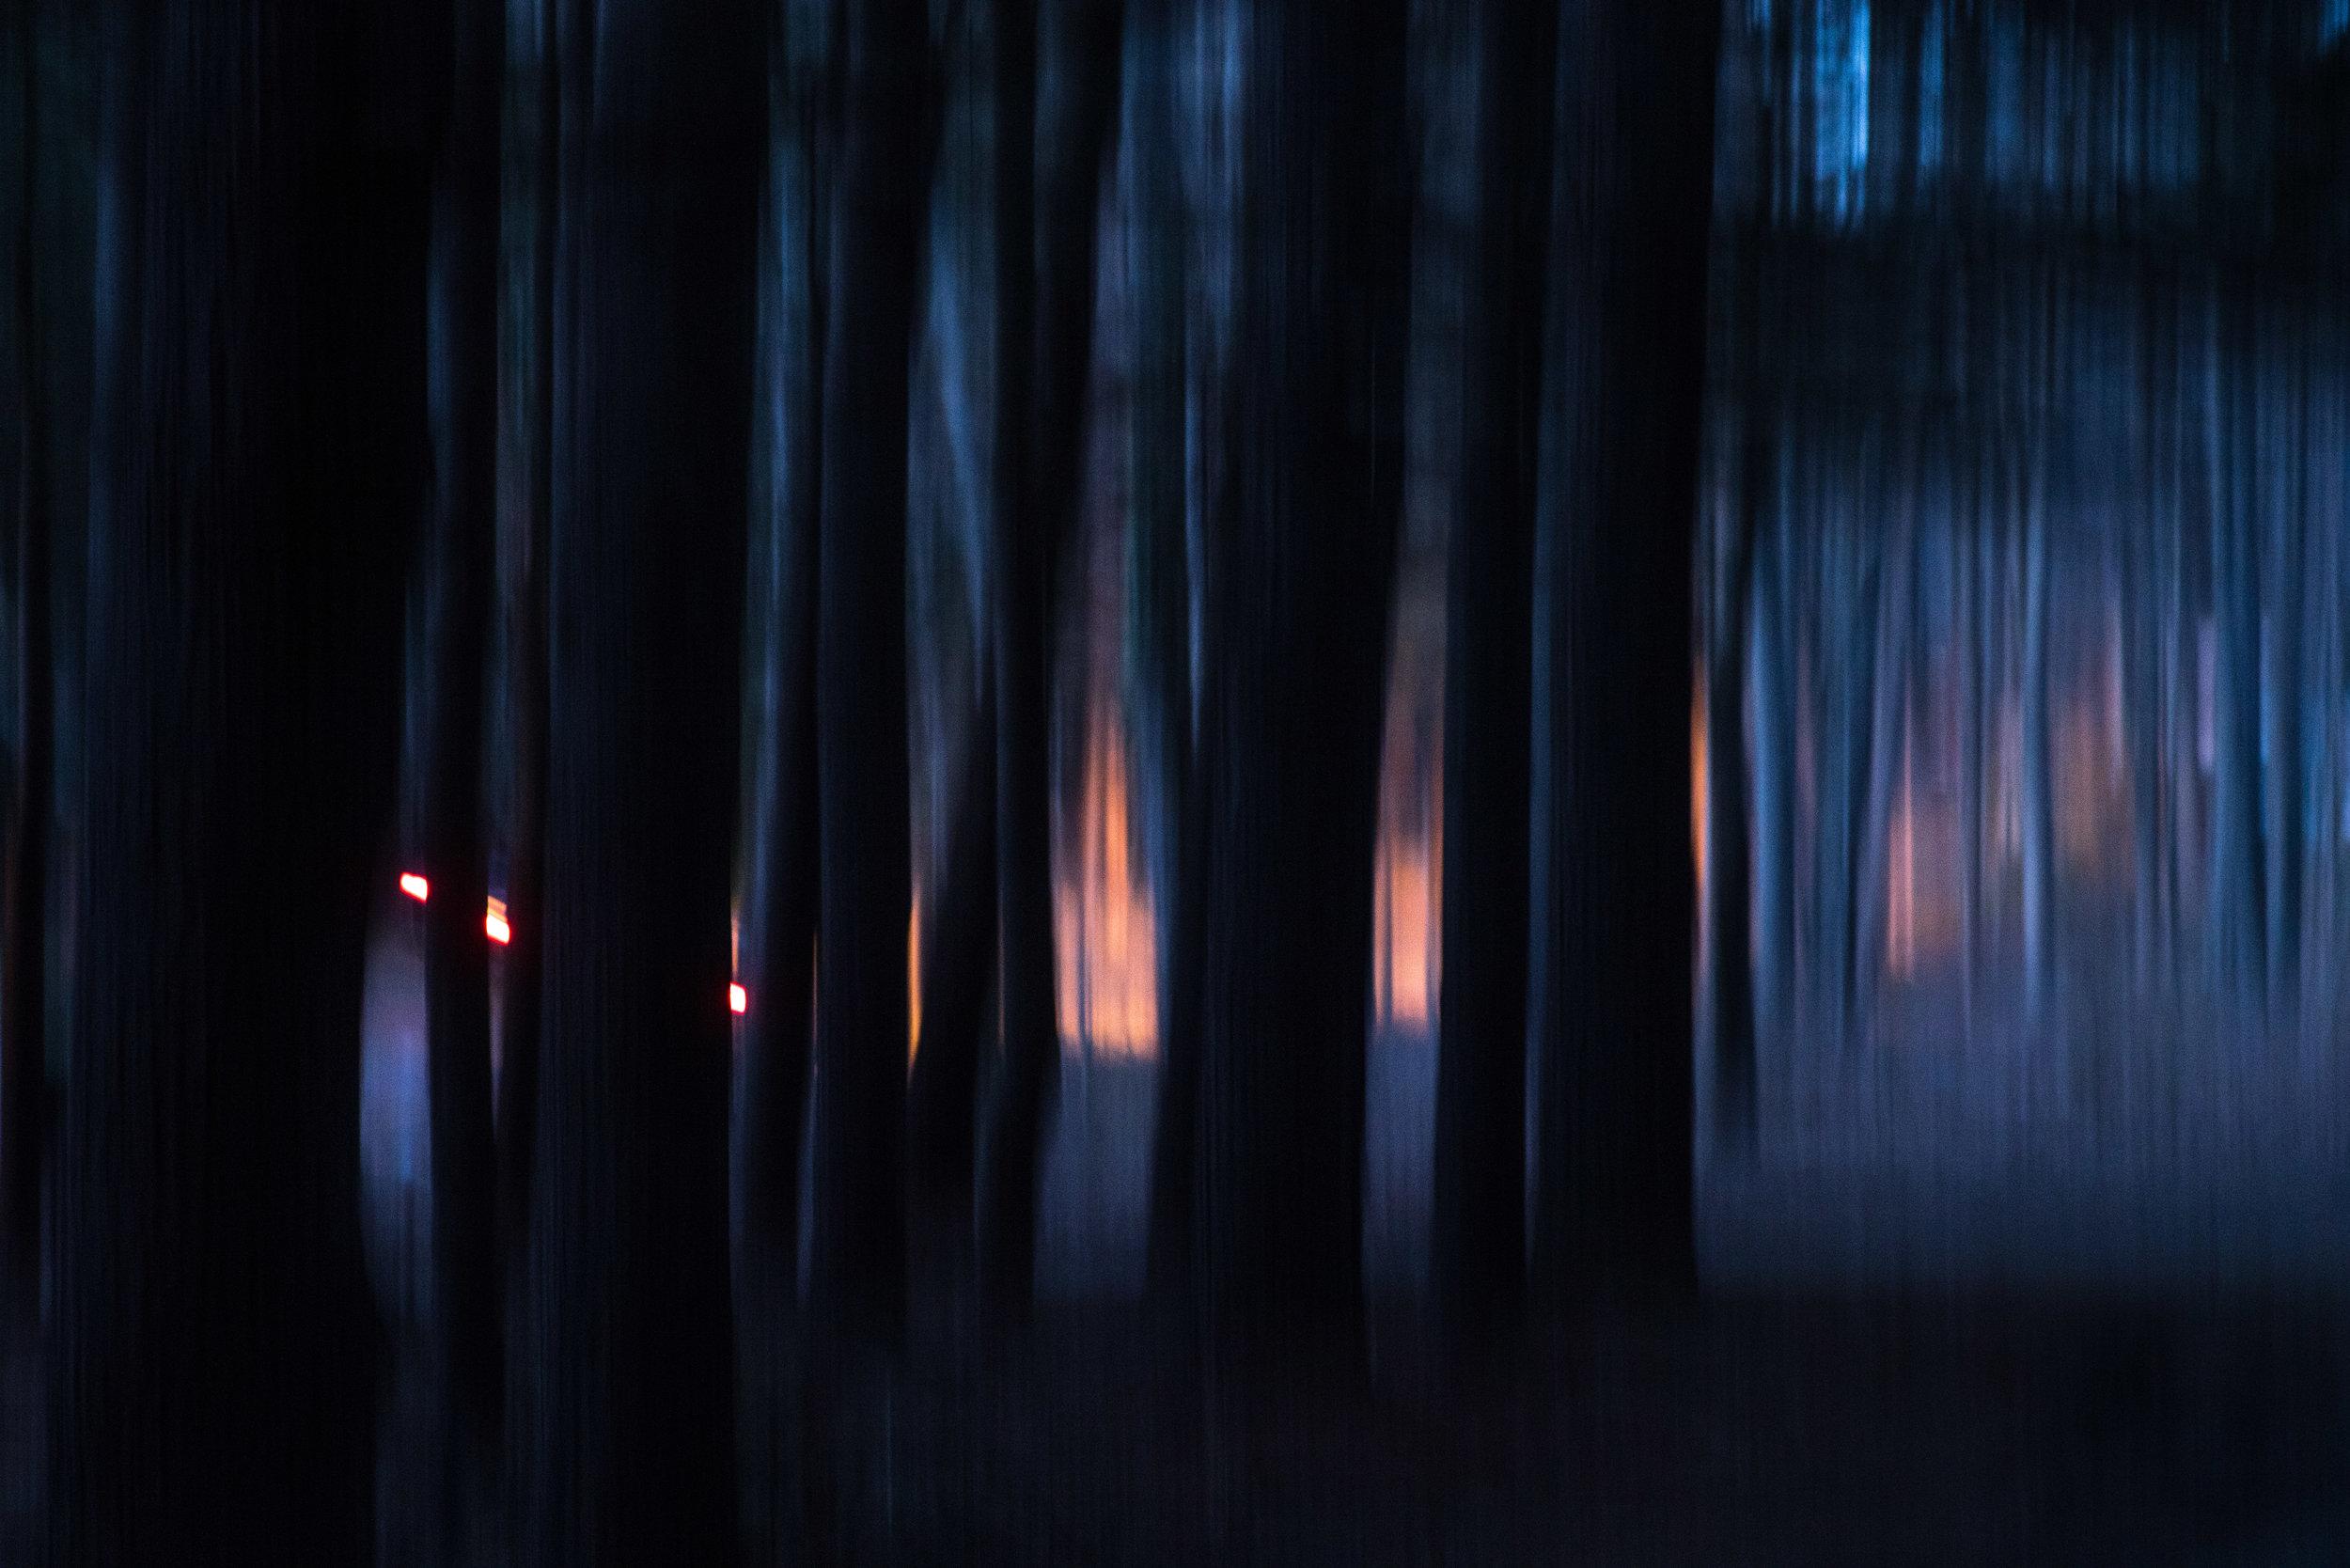 headlights_through_pines.jpg